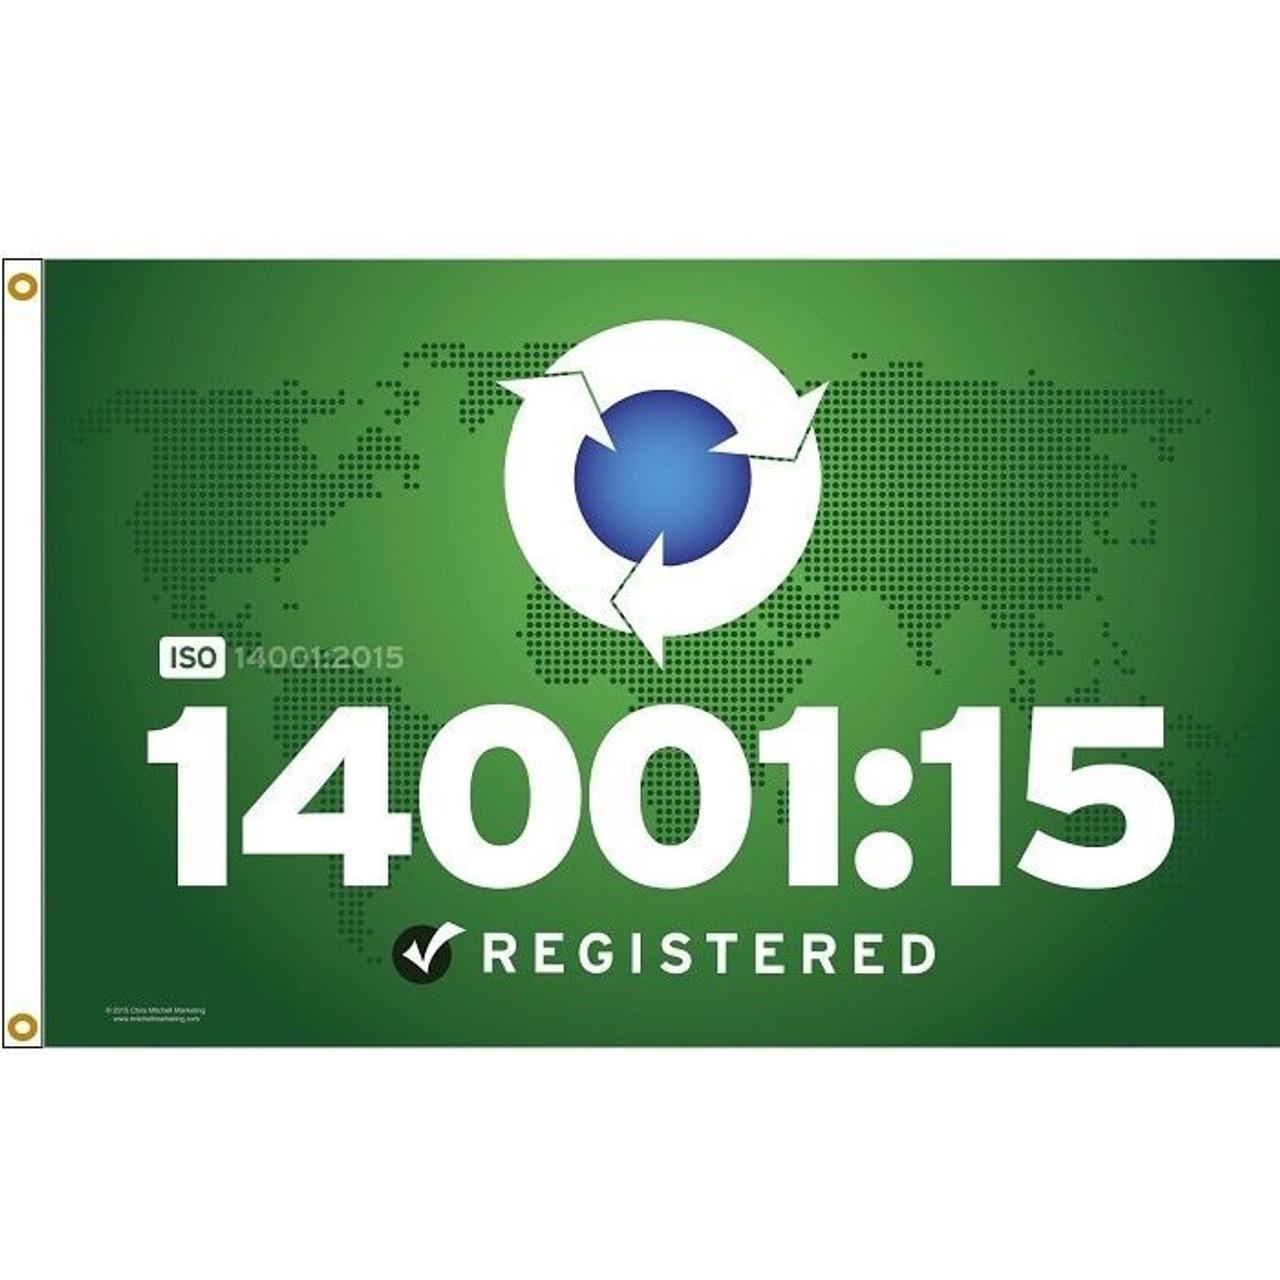 ISO 1400115 Flag